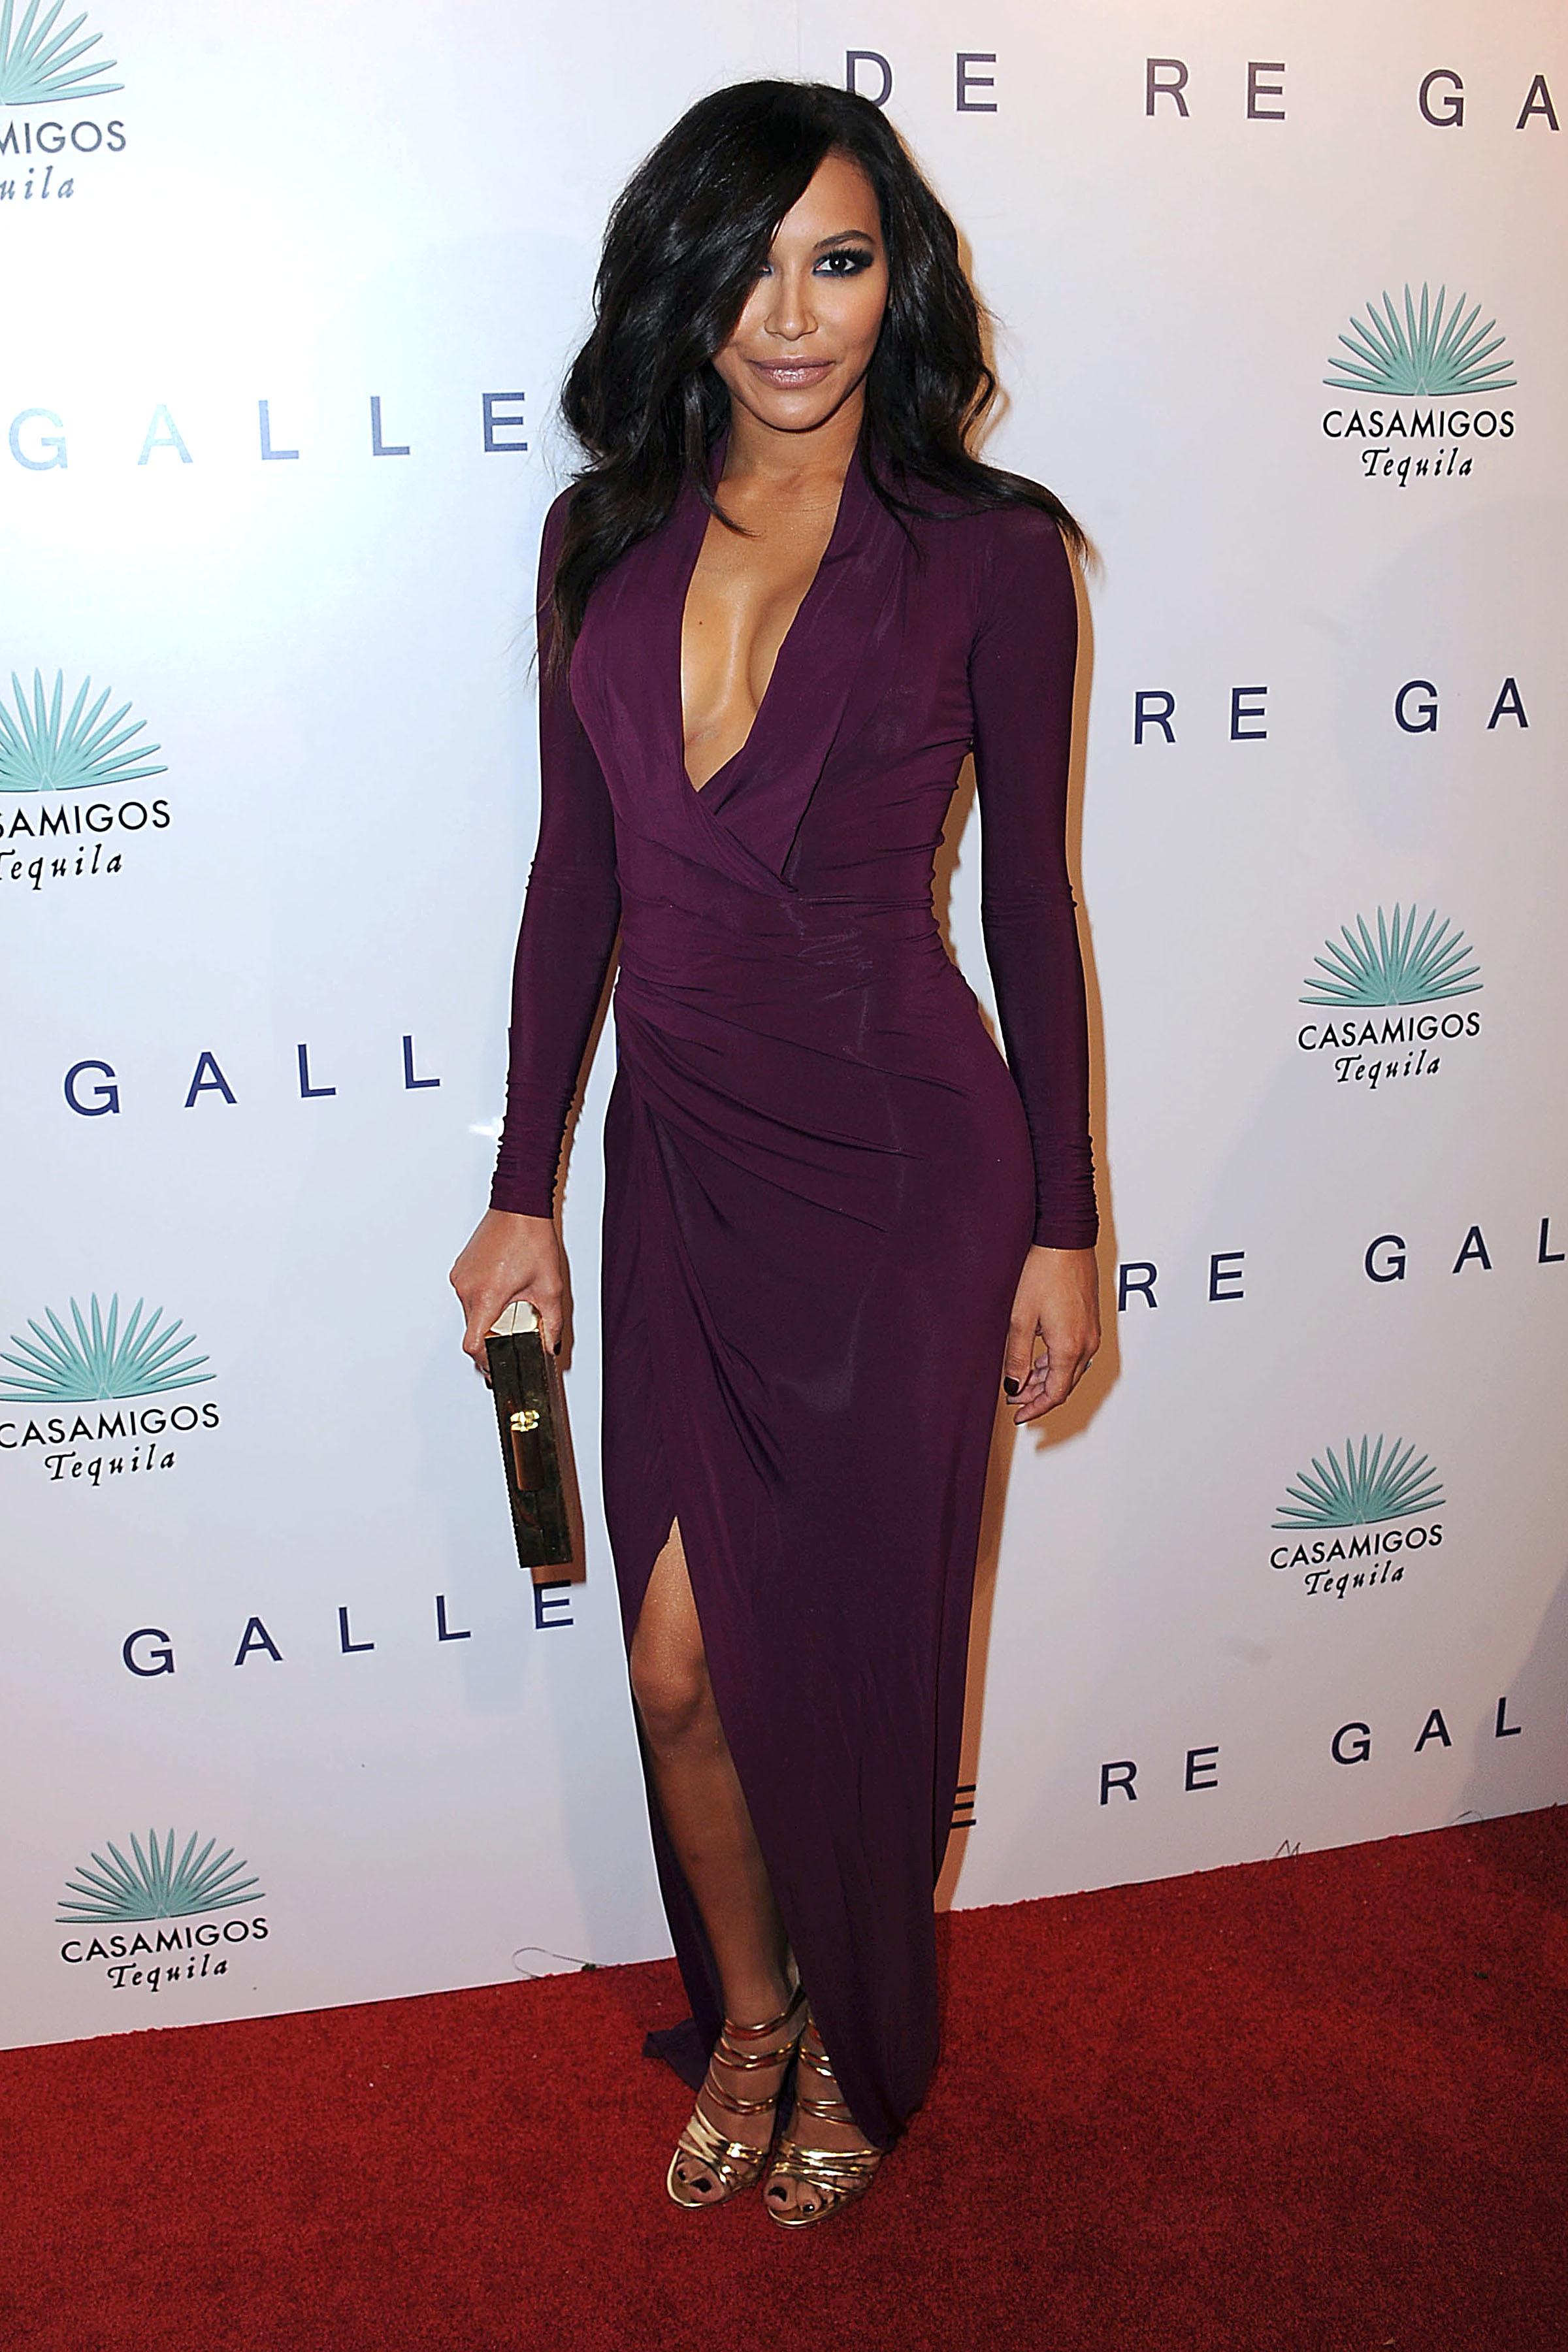 Naya Rivera slams Kim Kardashian over racy Paper cover